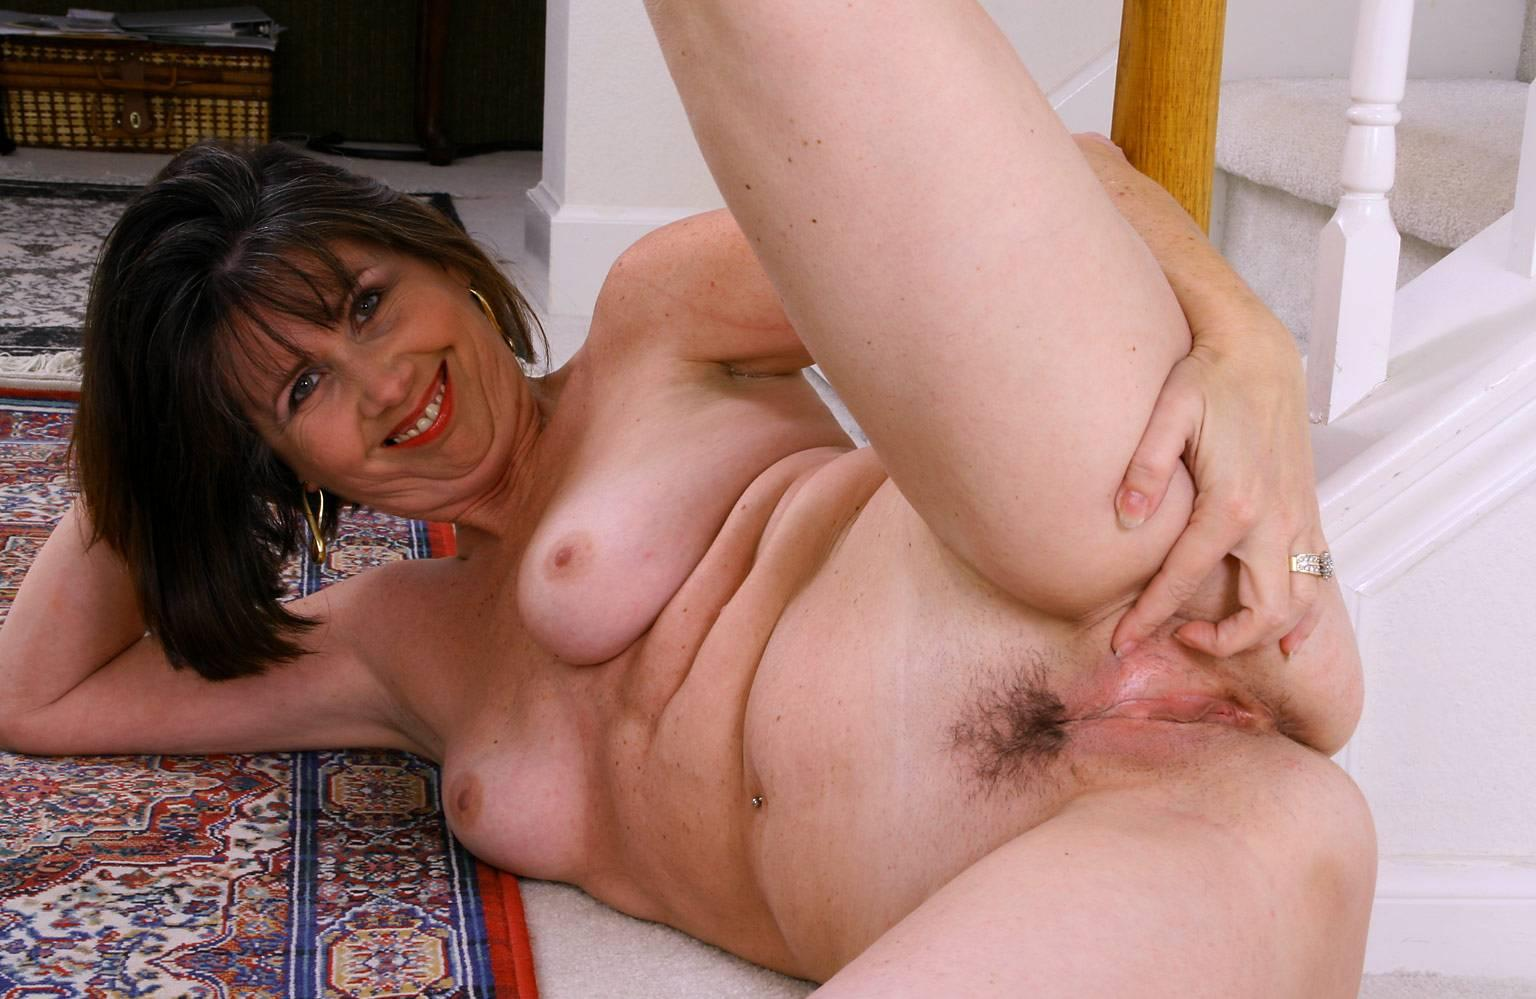 Real nake fairy pis erotica videos